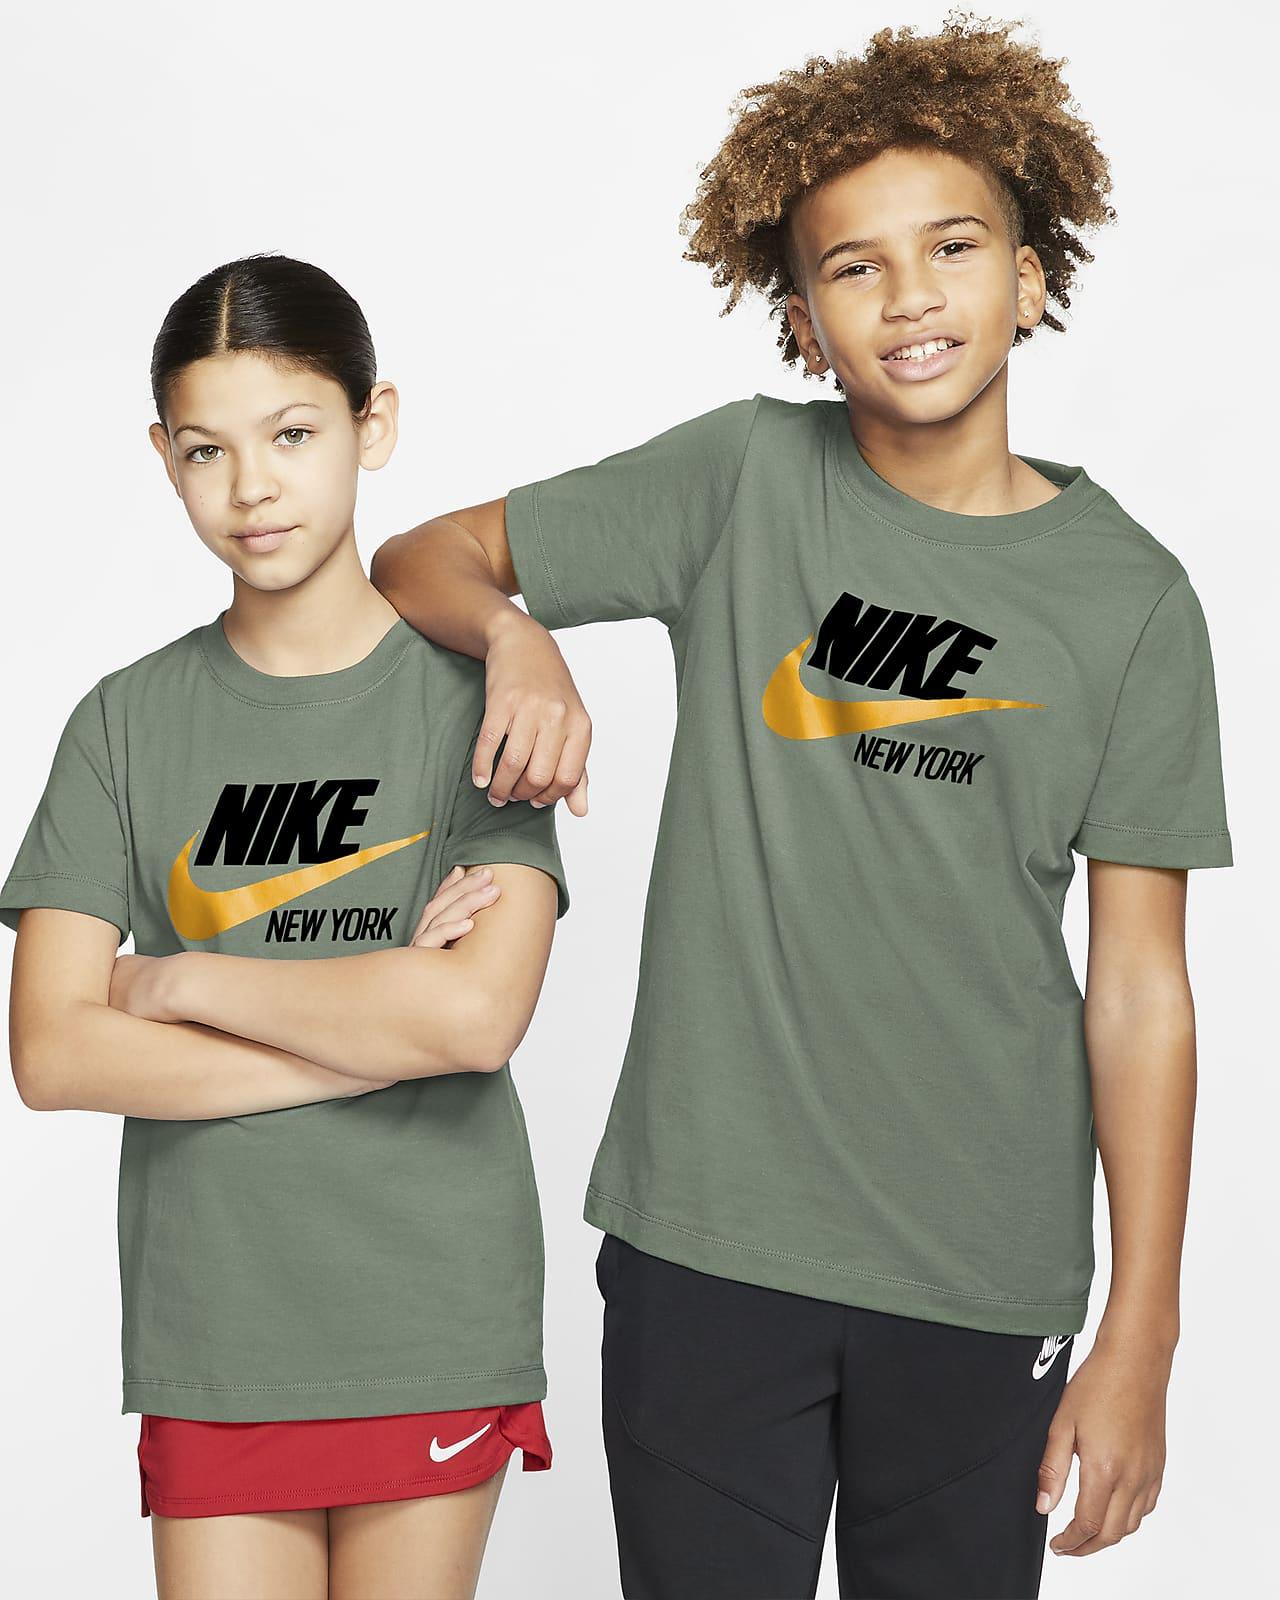 Nike Sportswear New York Big Kids' T-Shirt